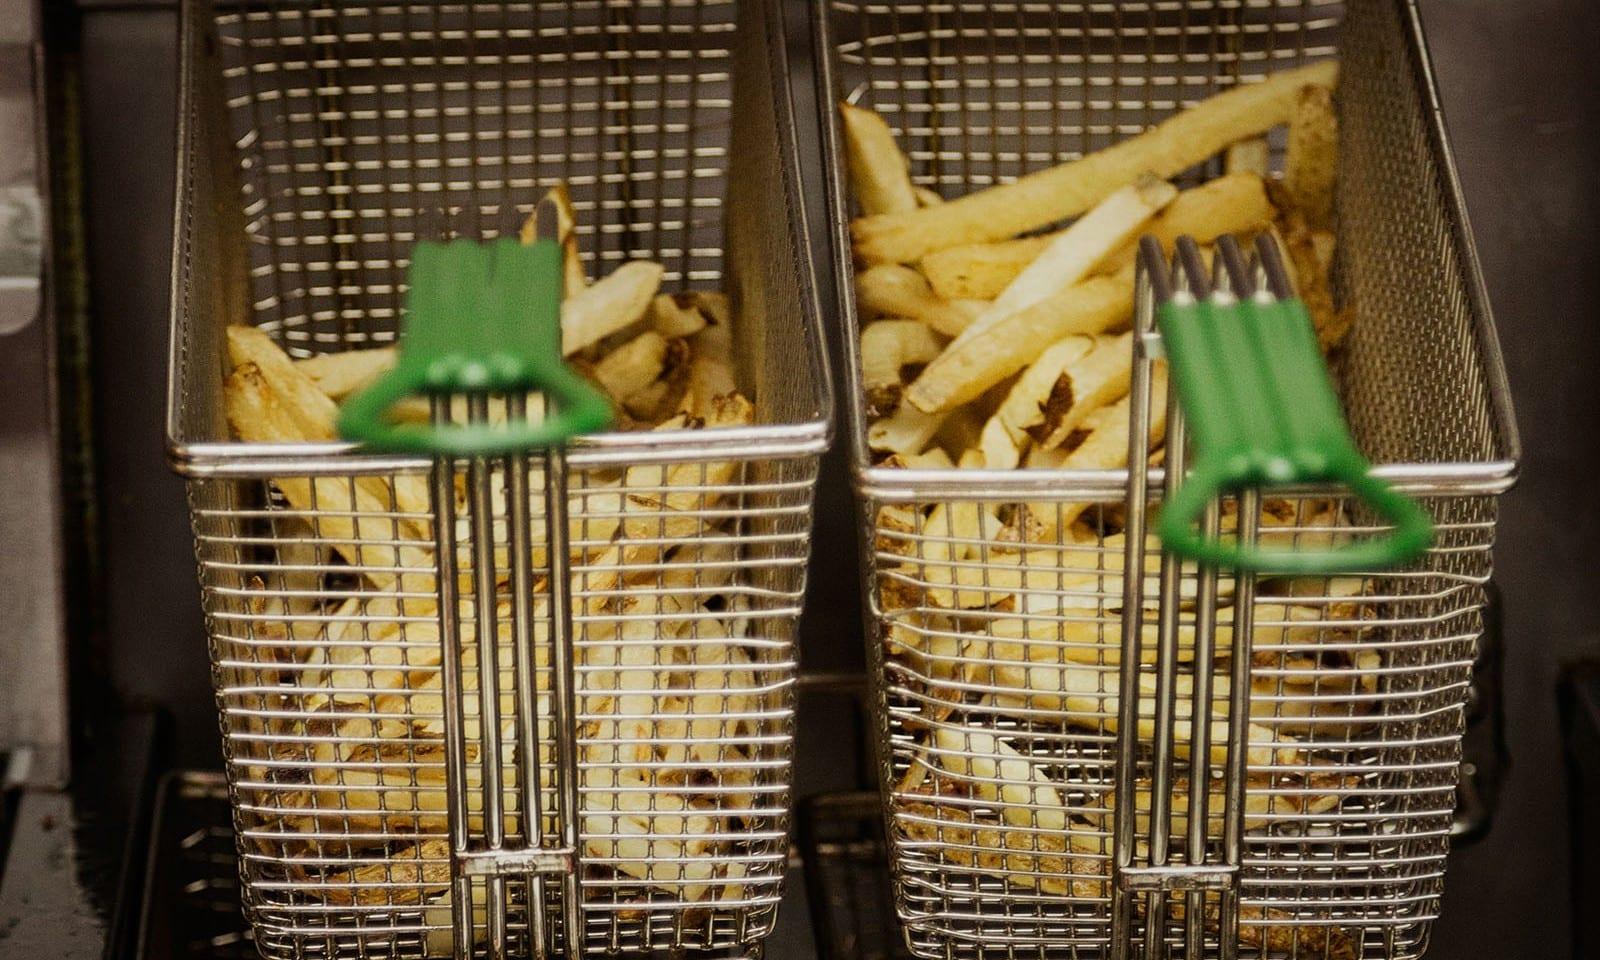 5-Guys-Burger-and-Fries-New-York-03-1600×960